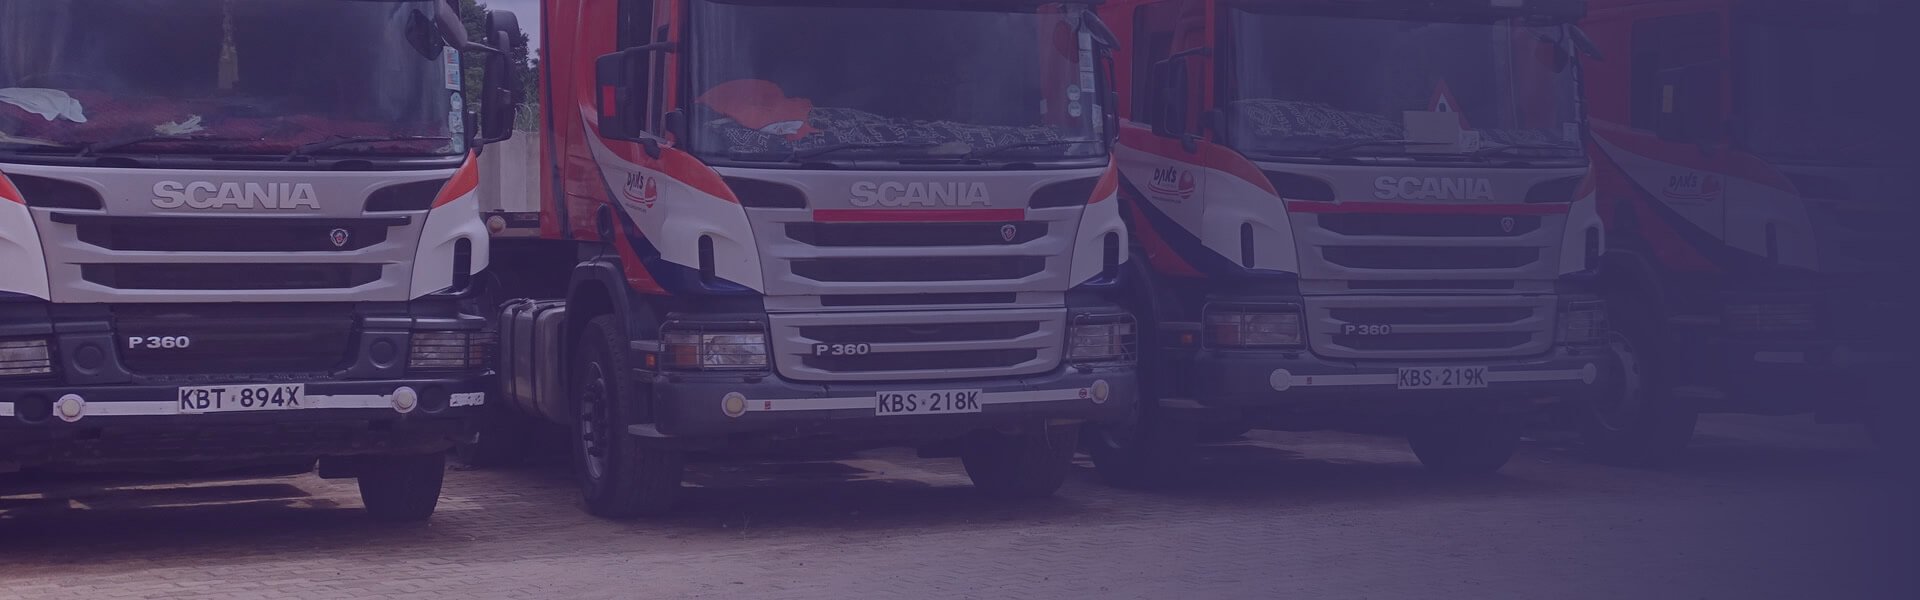 DAKS Couriers Transport